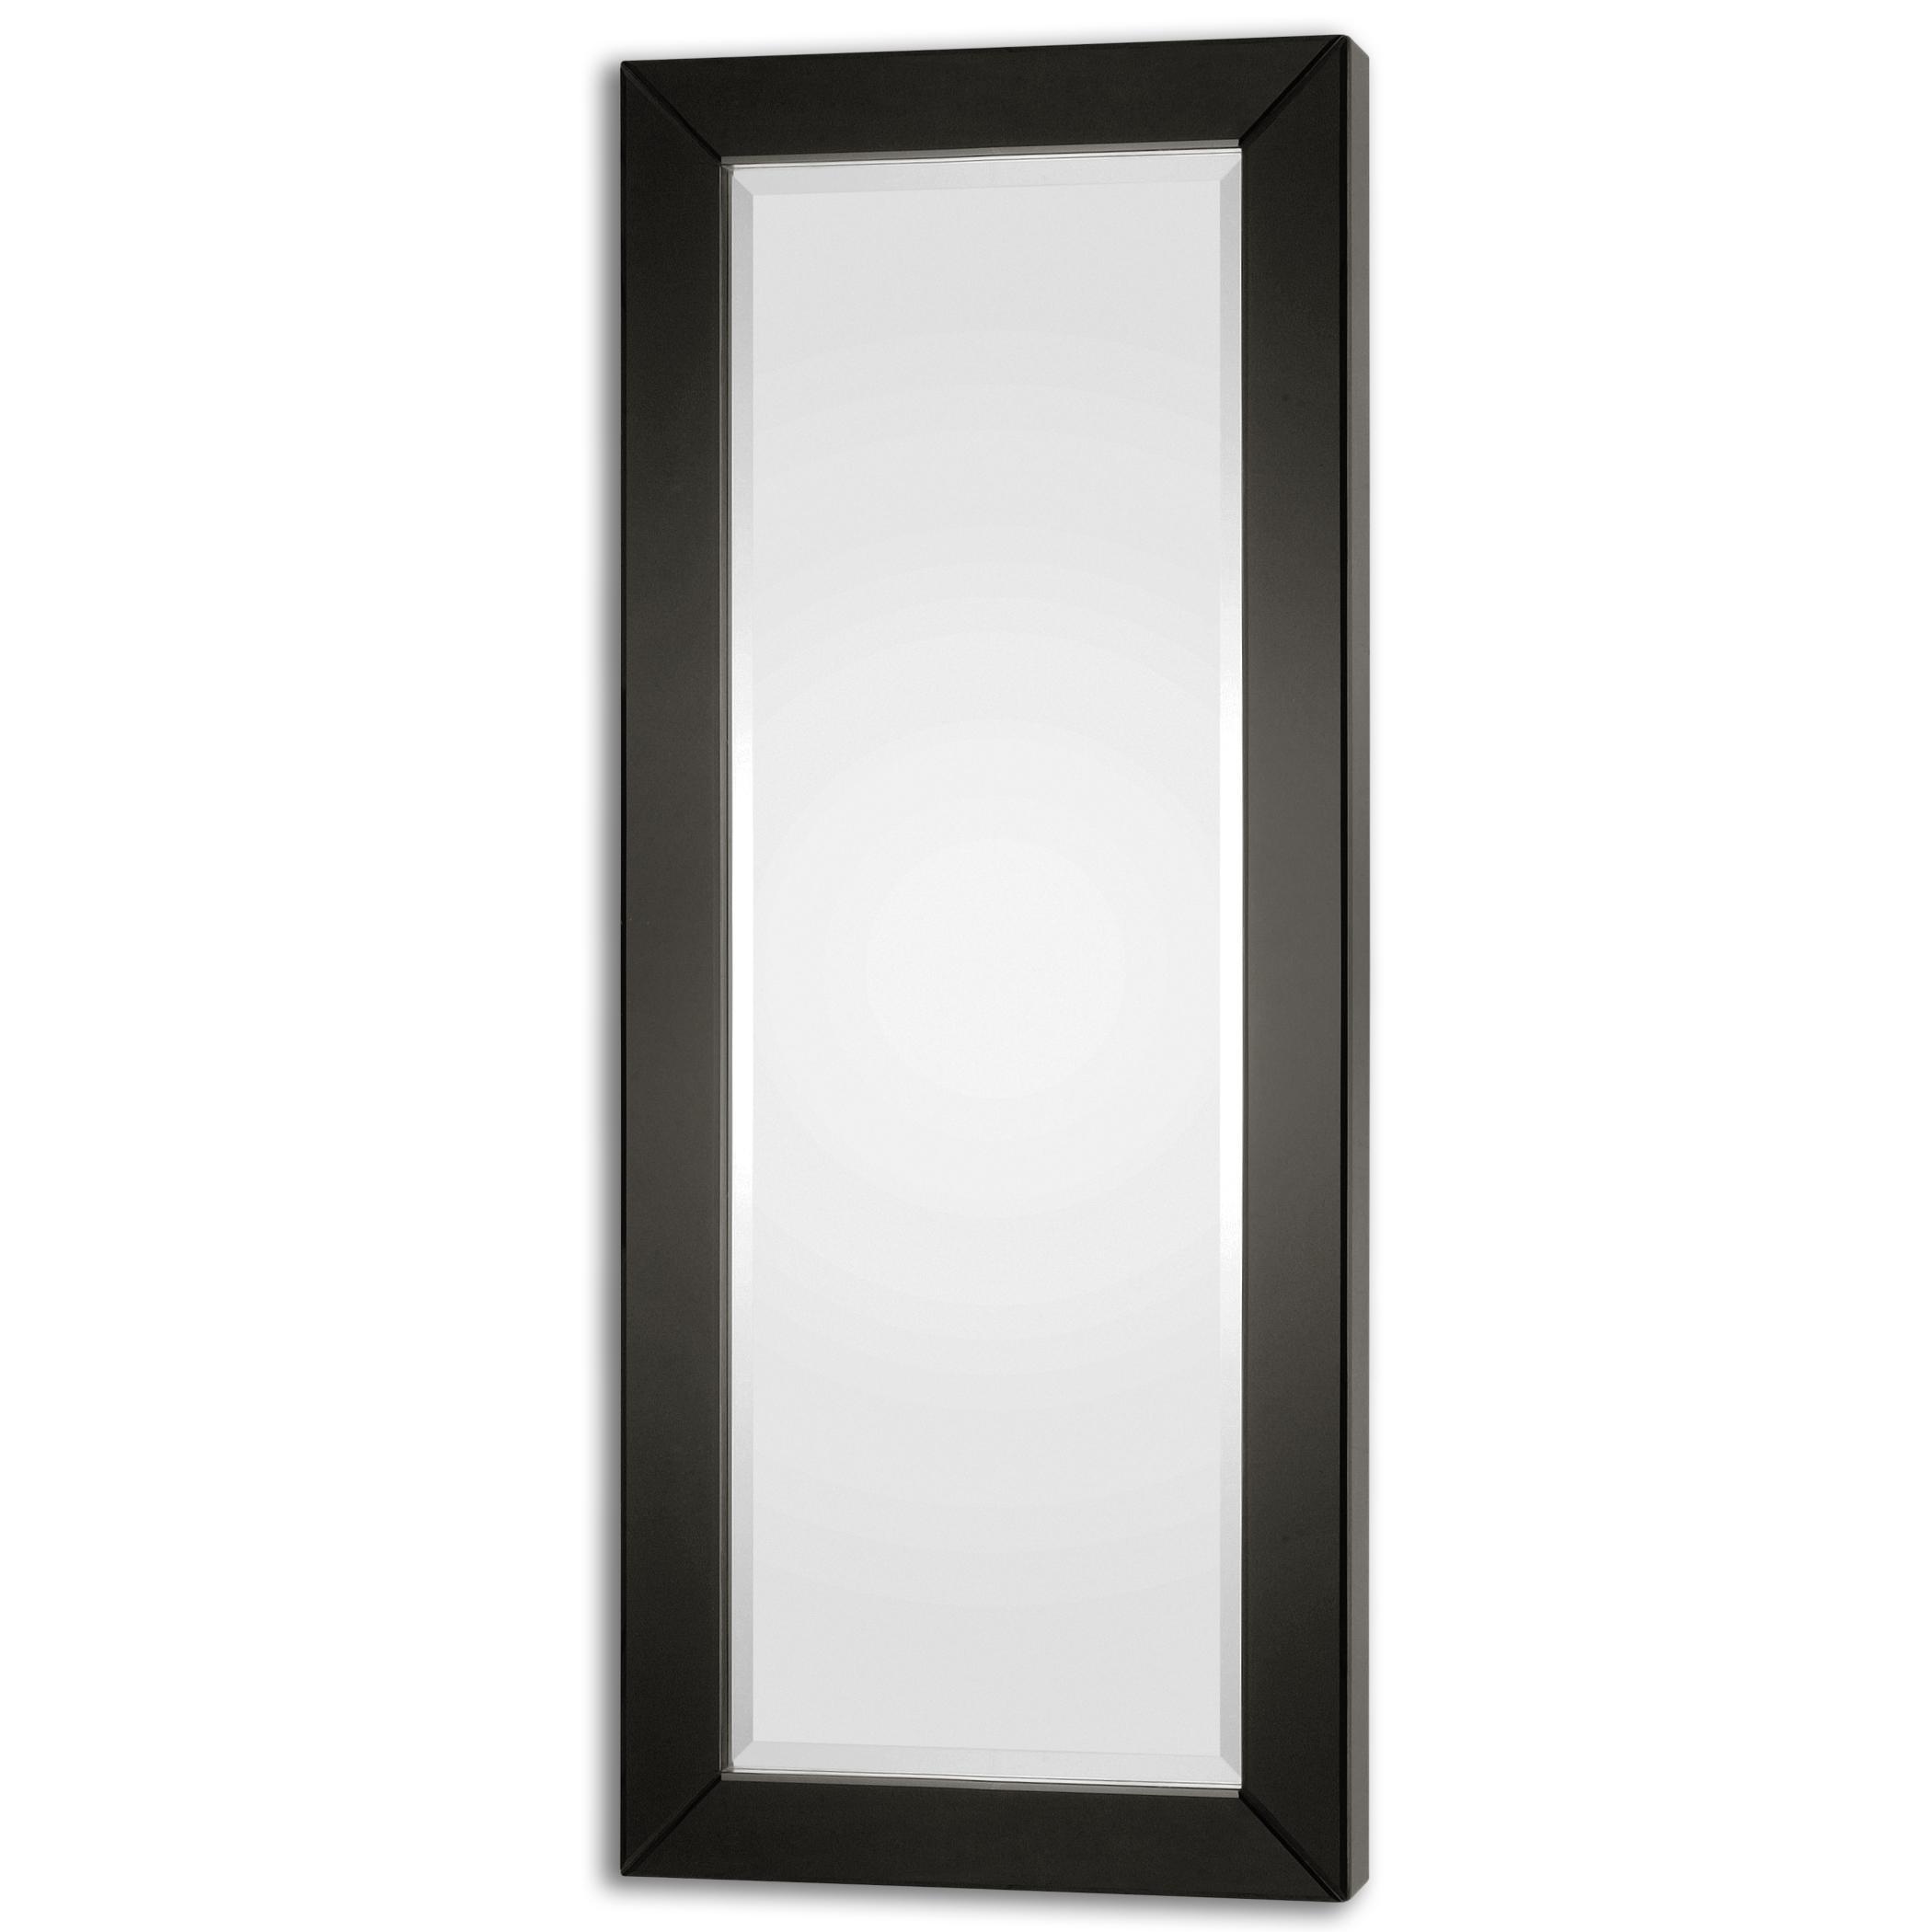 Uttermost Mirrors Hilarion Black Framed Mirror - Item Number: 08128